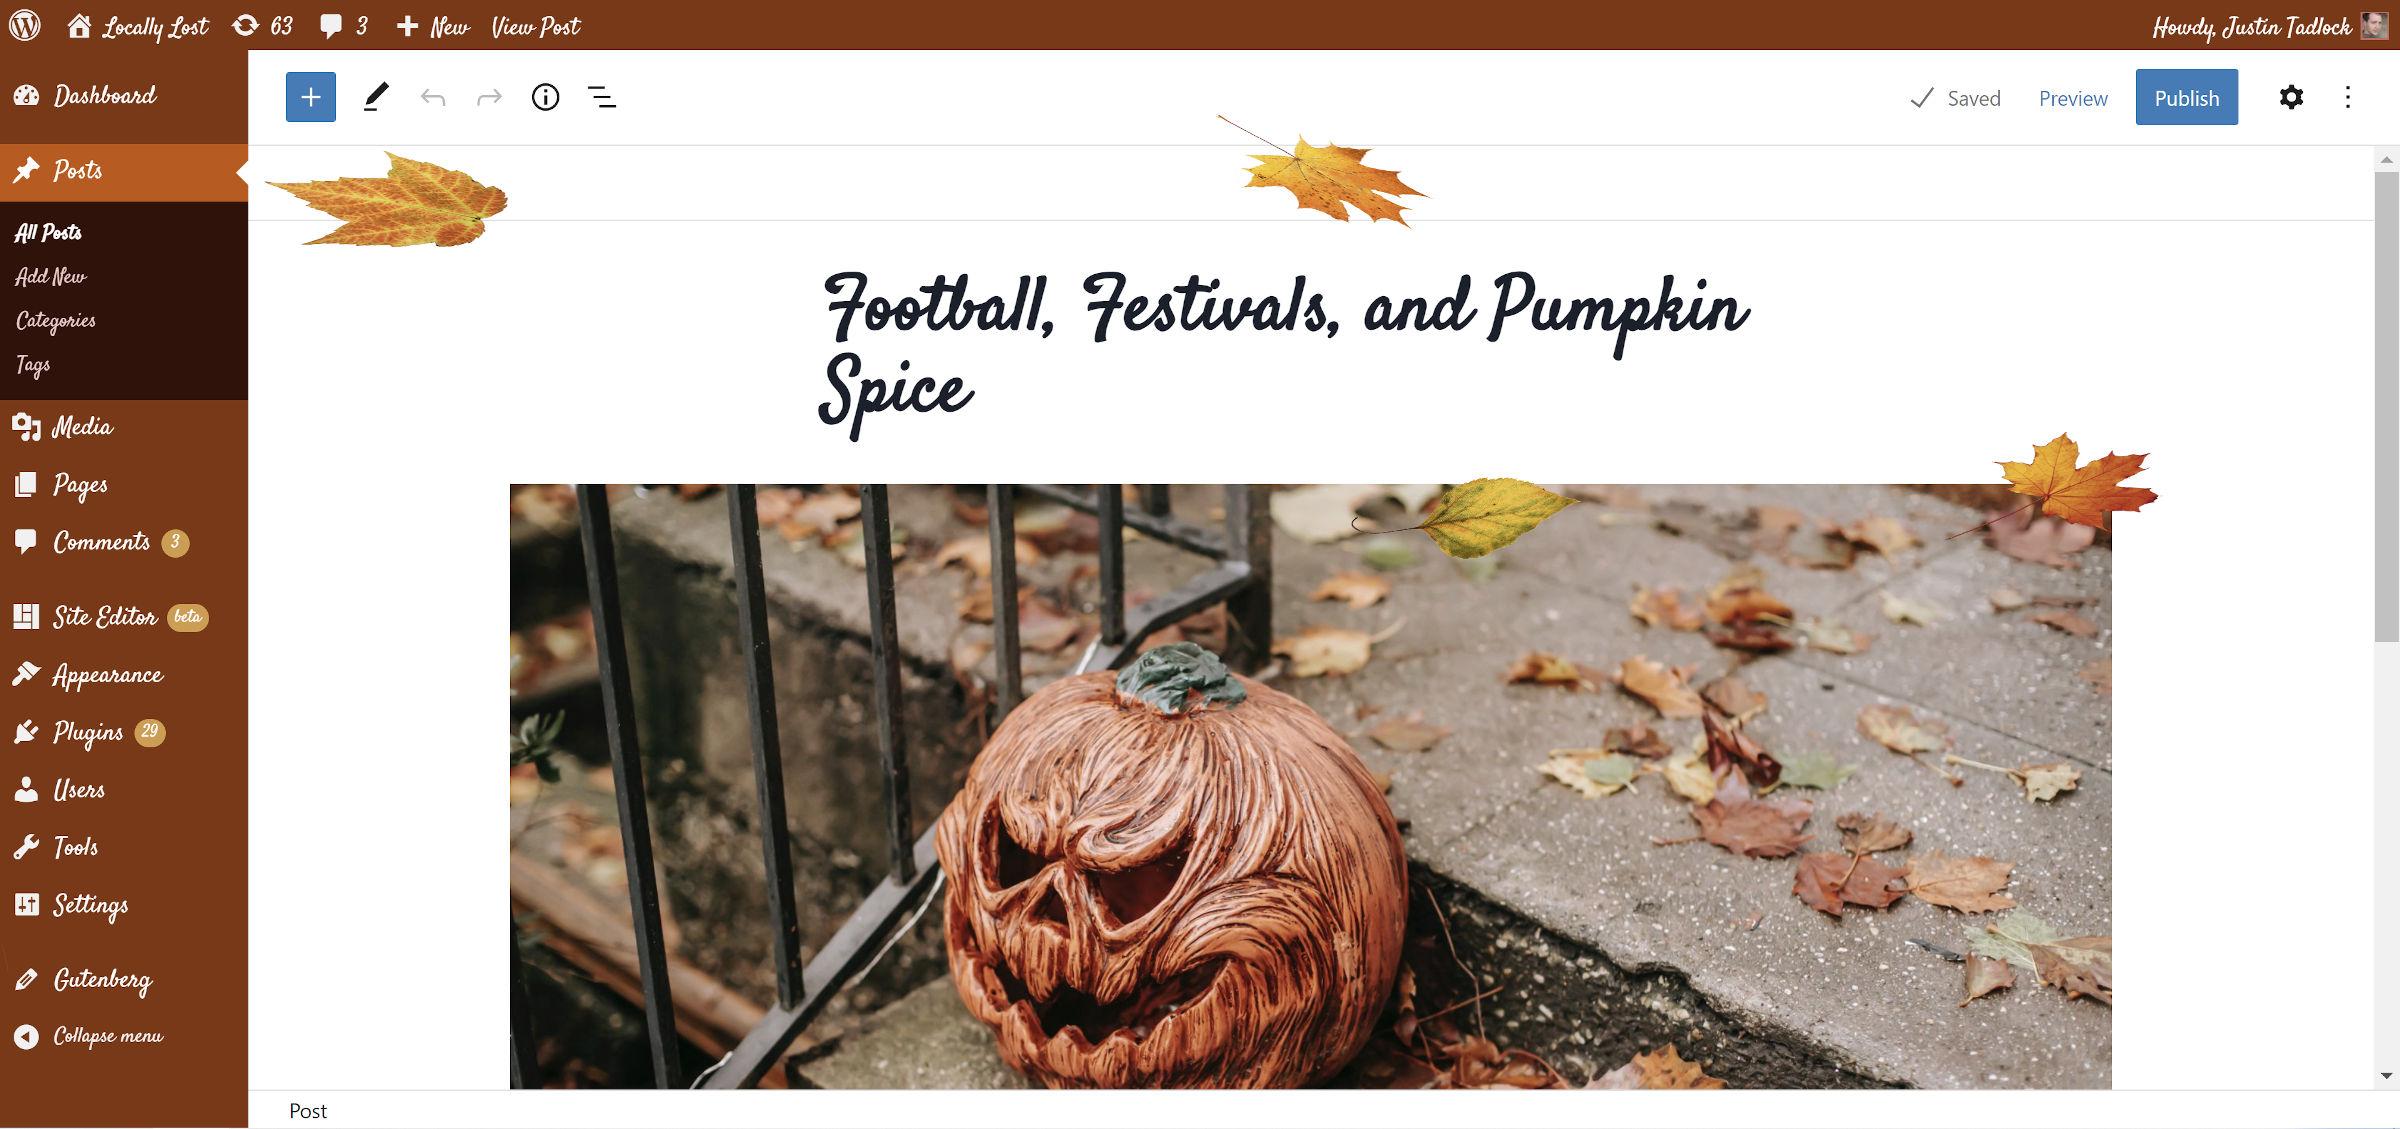 Pumpkin Spice Admin plugin showcased with falling leaves in the WordPress post editor.